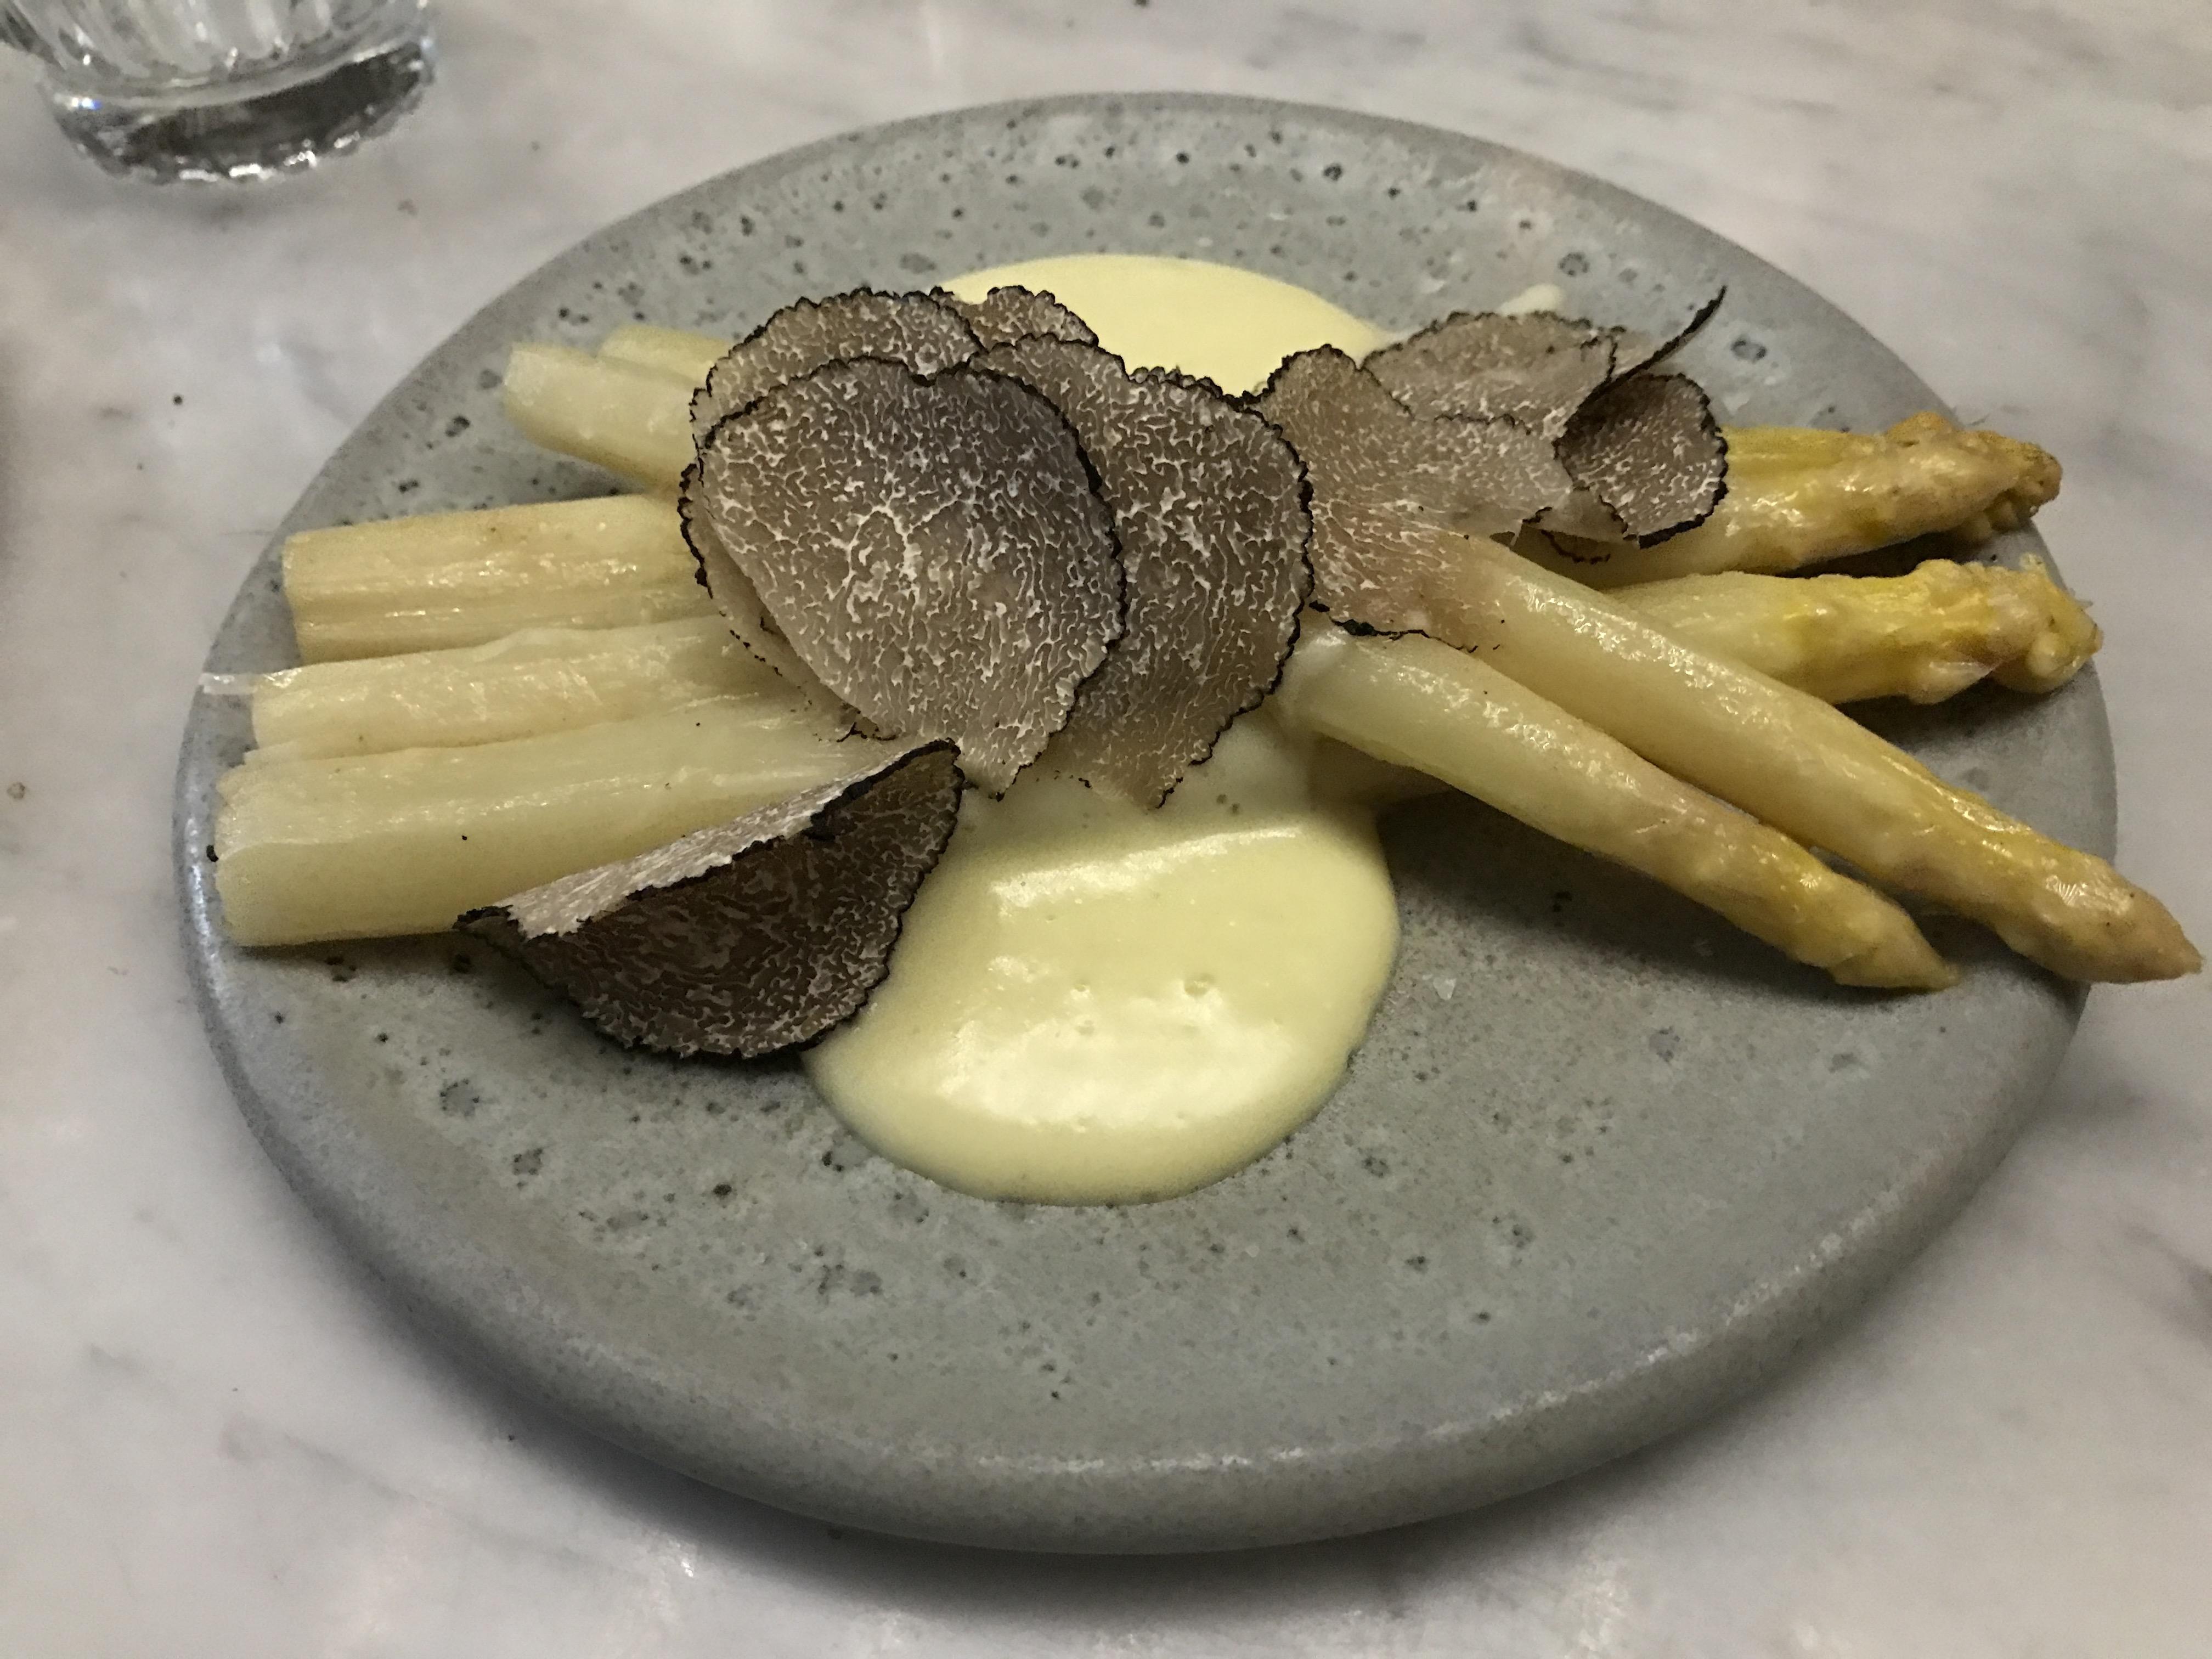 Ellsworth restaurant in Paris   parisbymouth.com